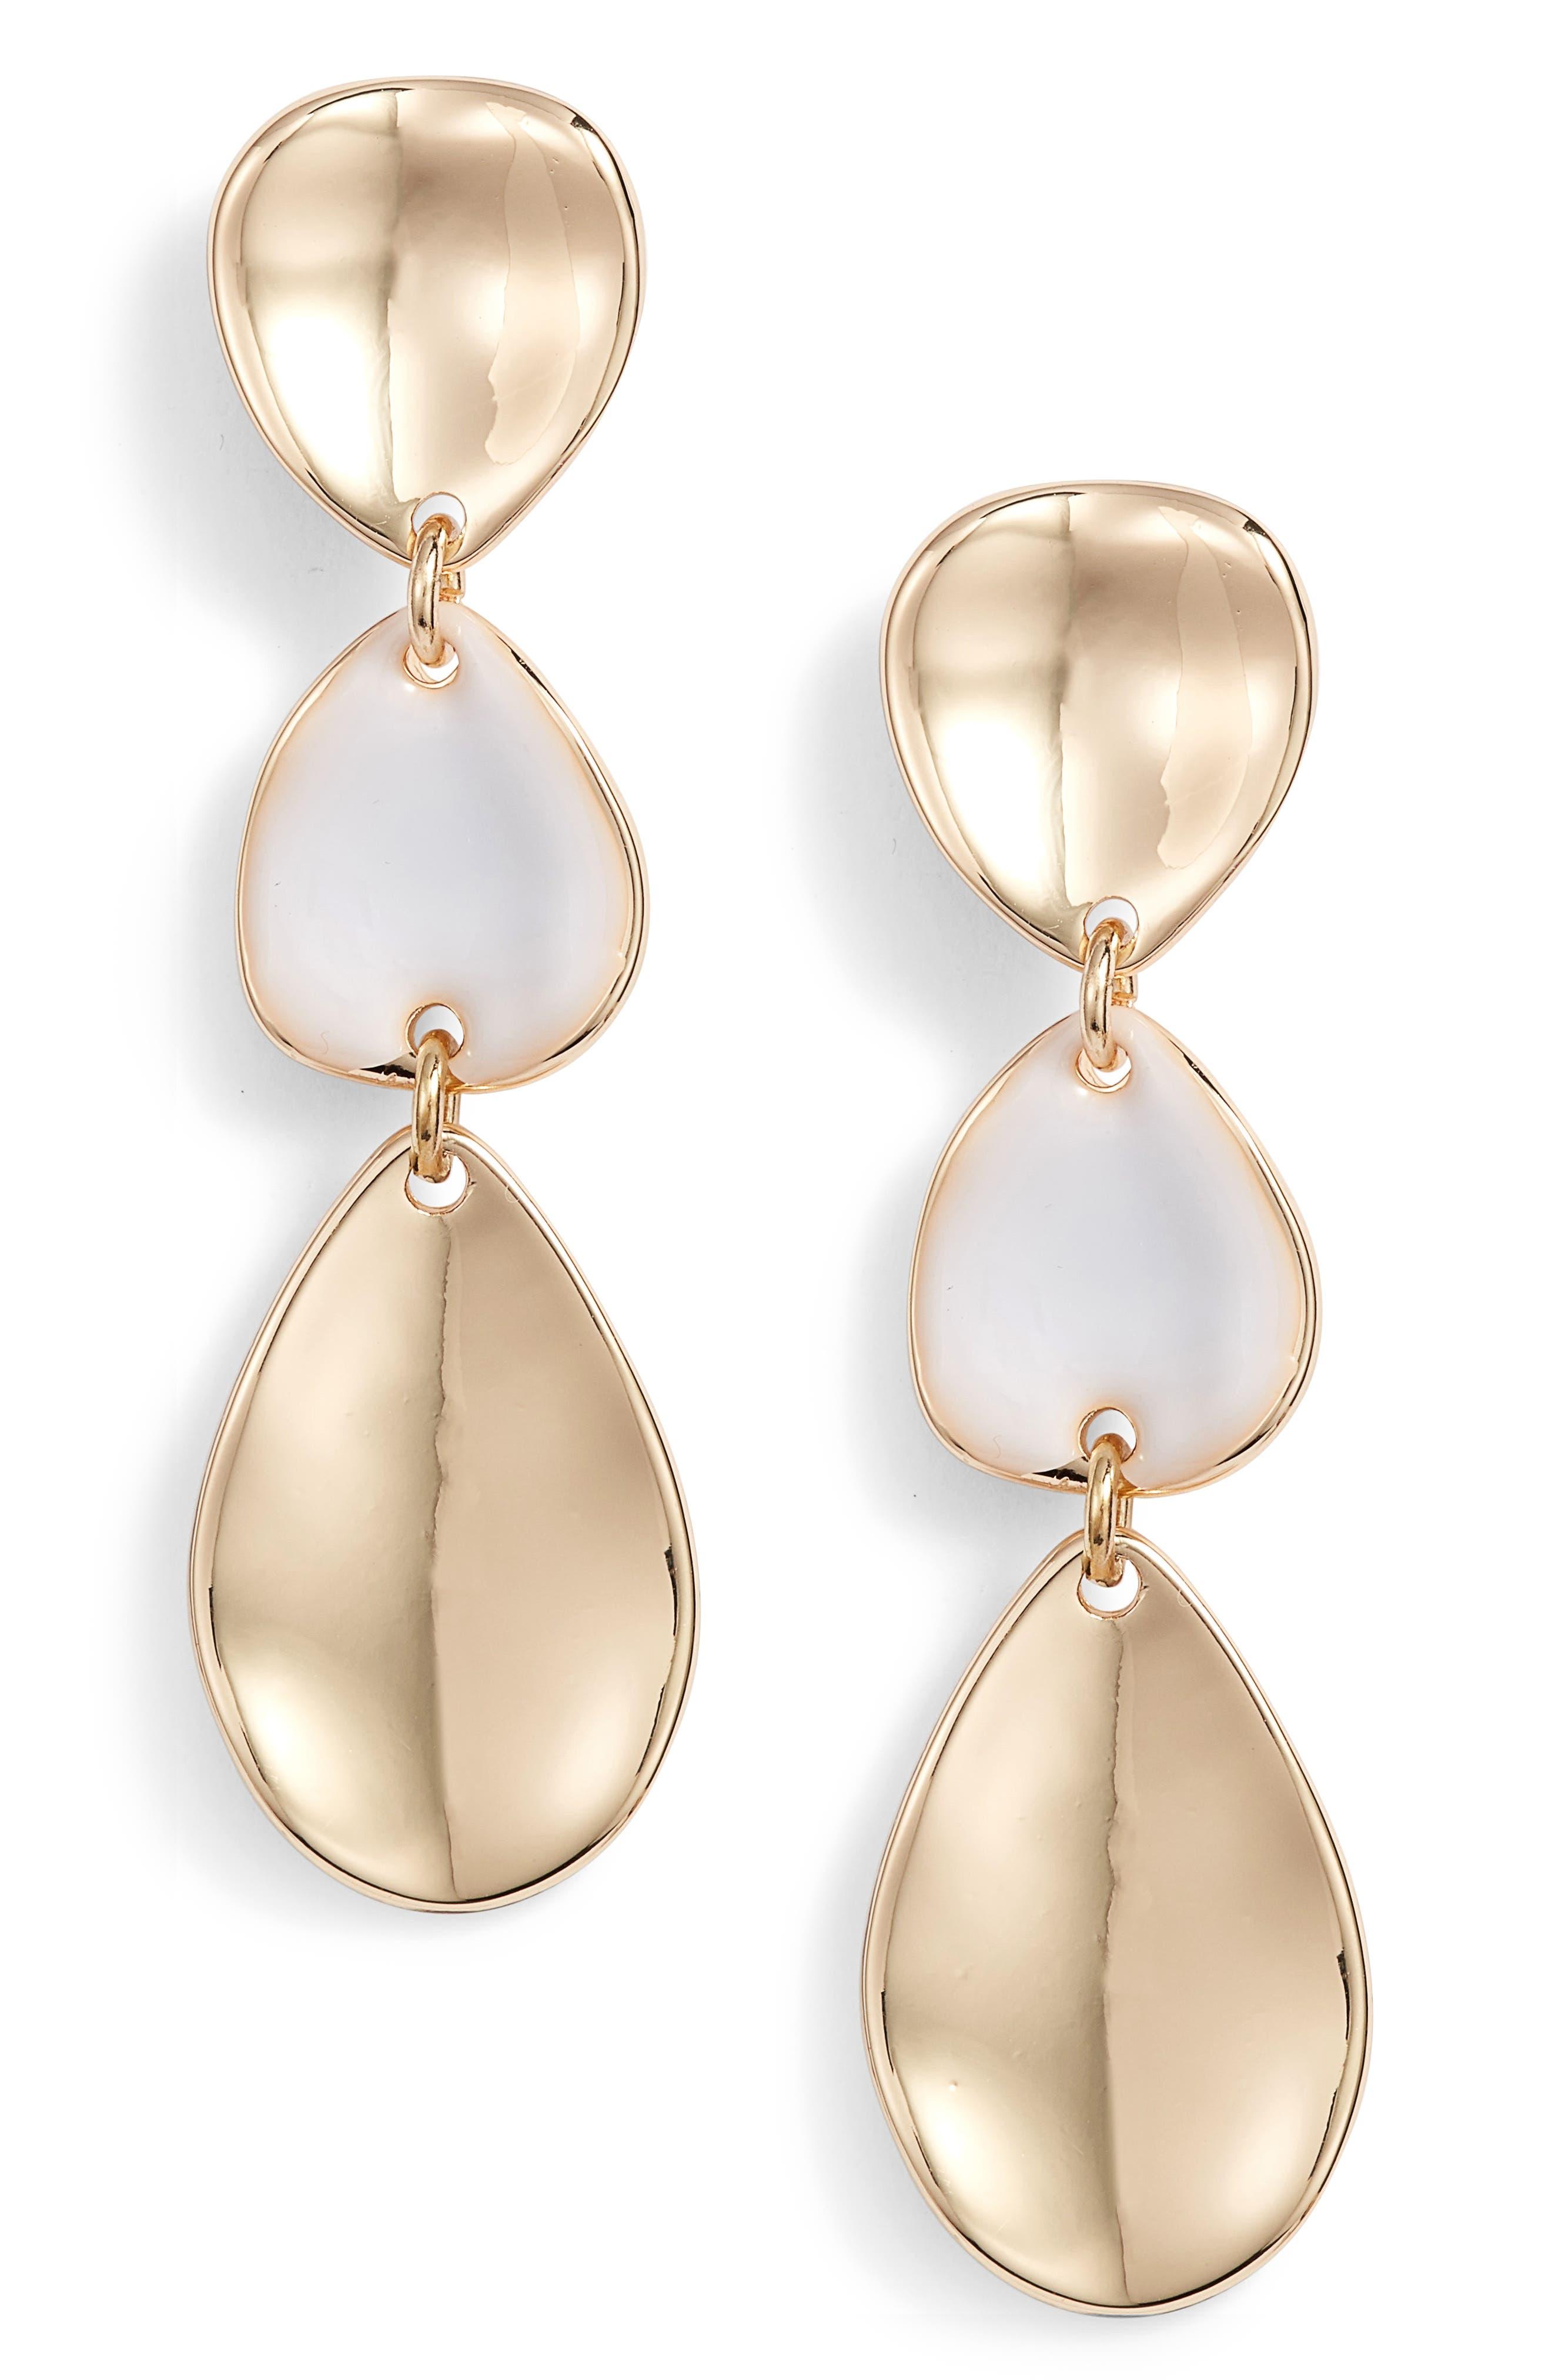 Painted Petal Triple Drop Earrings,                             Main thumbnail 1, color,                             100